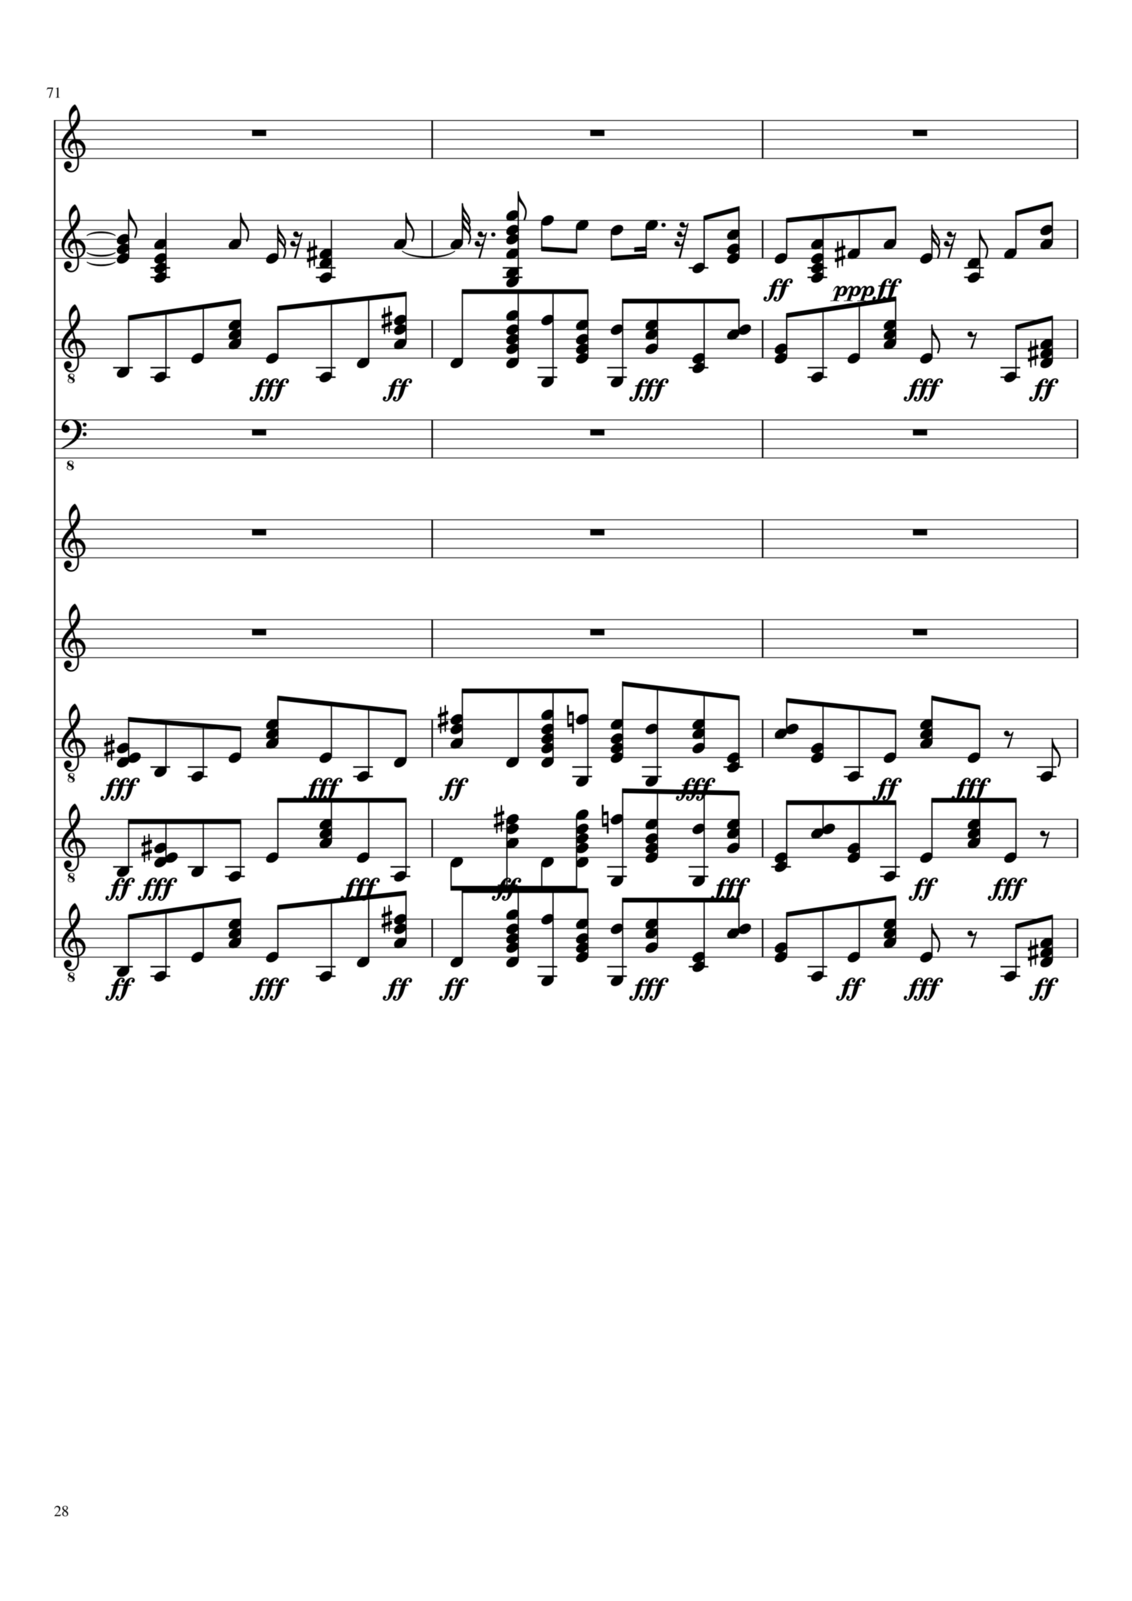 18 berez slide, Image 28